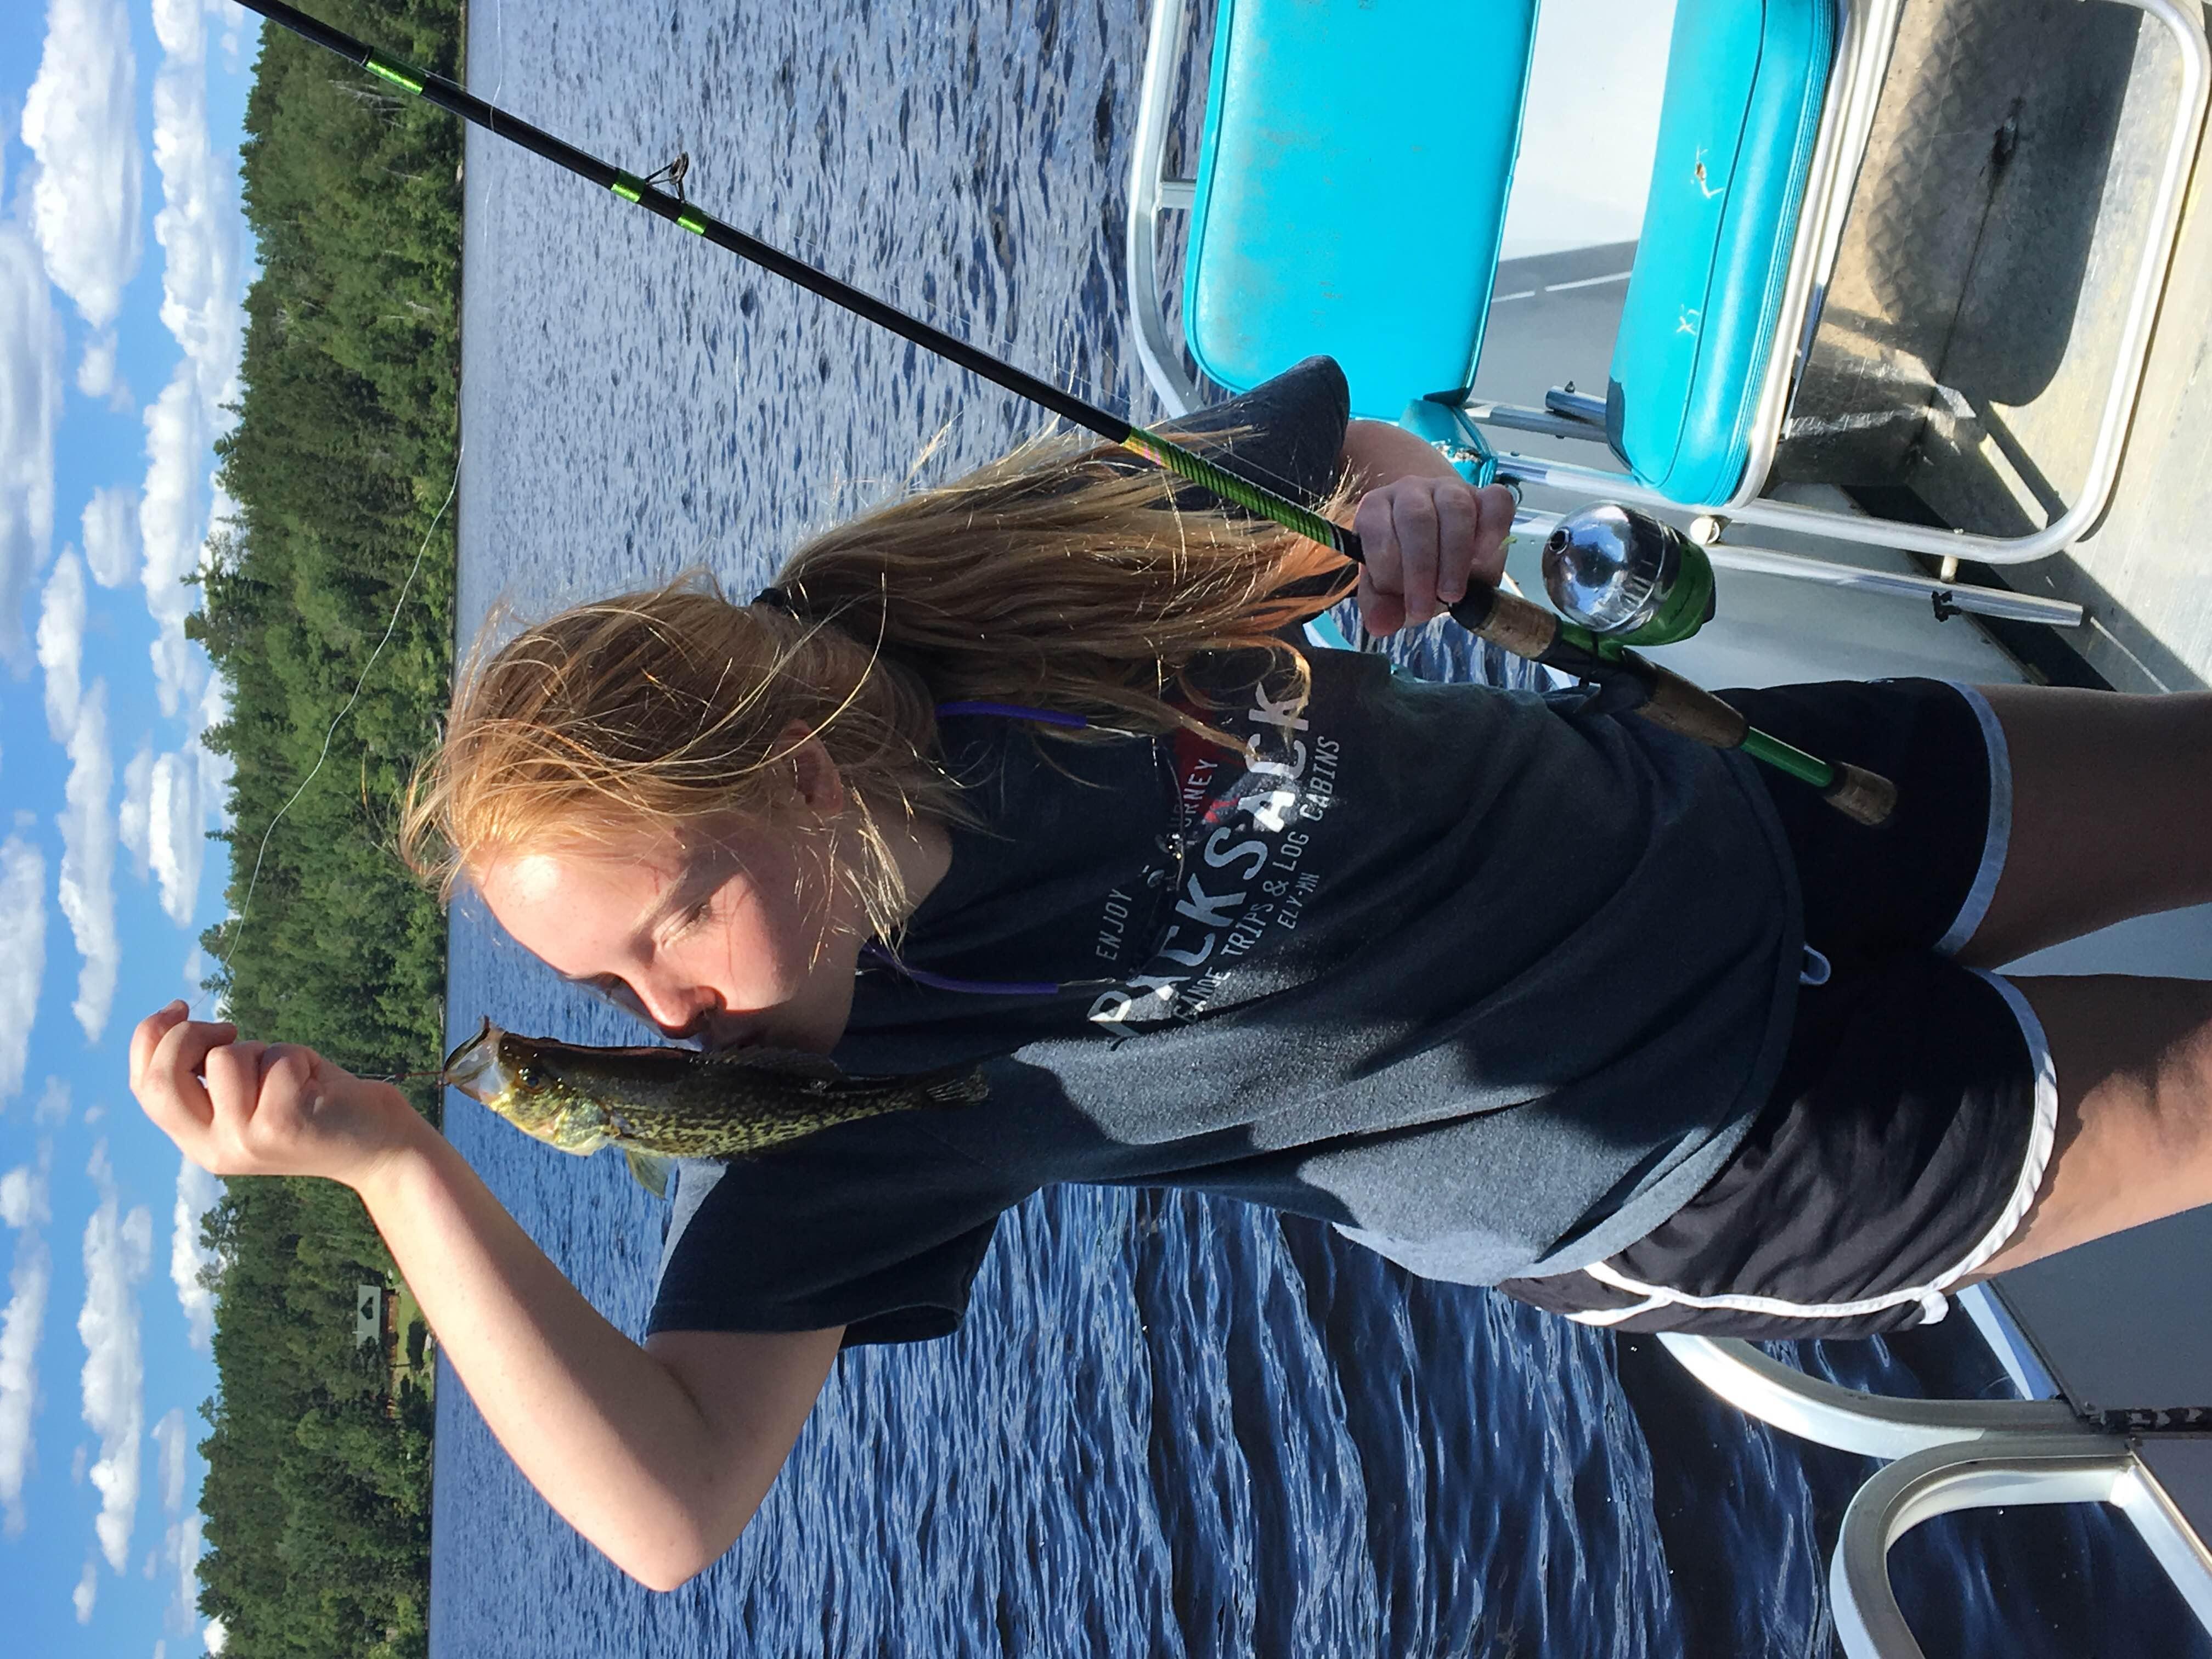 BWCA fishing: Why kiss the fish?